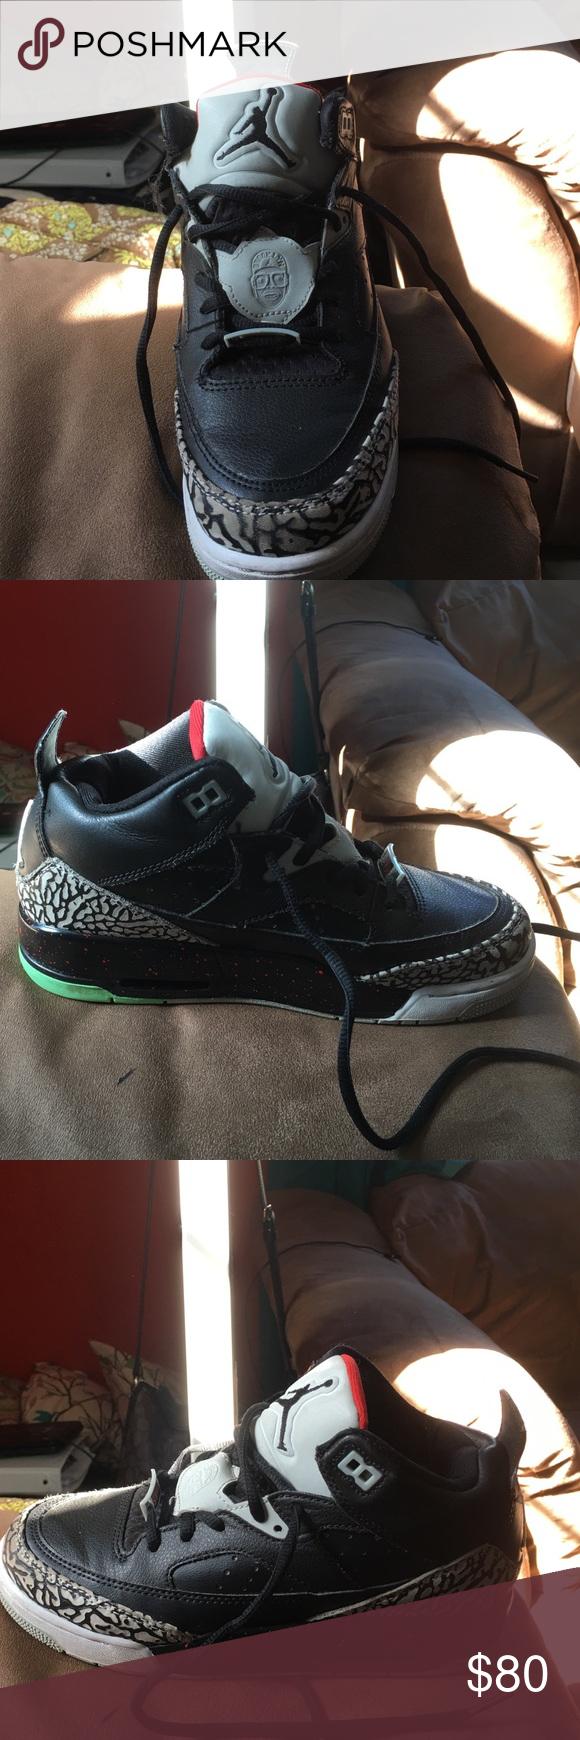 Fashion Nike Air Jordan 5 Retro Black Metallic Silver 440888-010